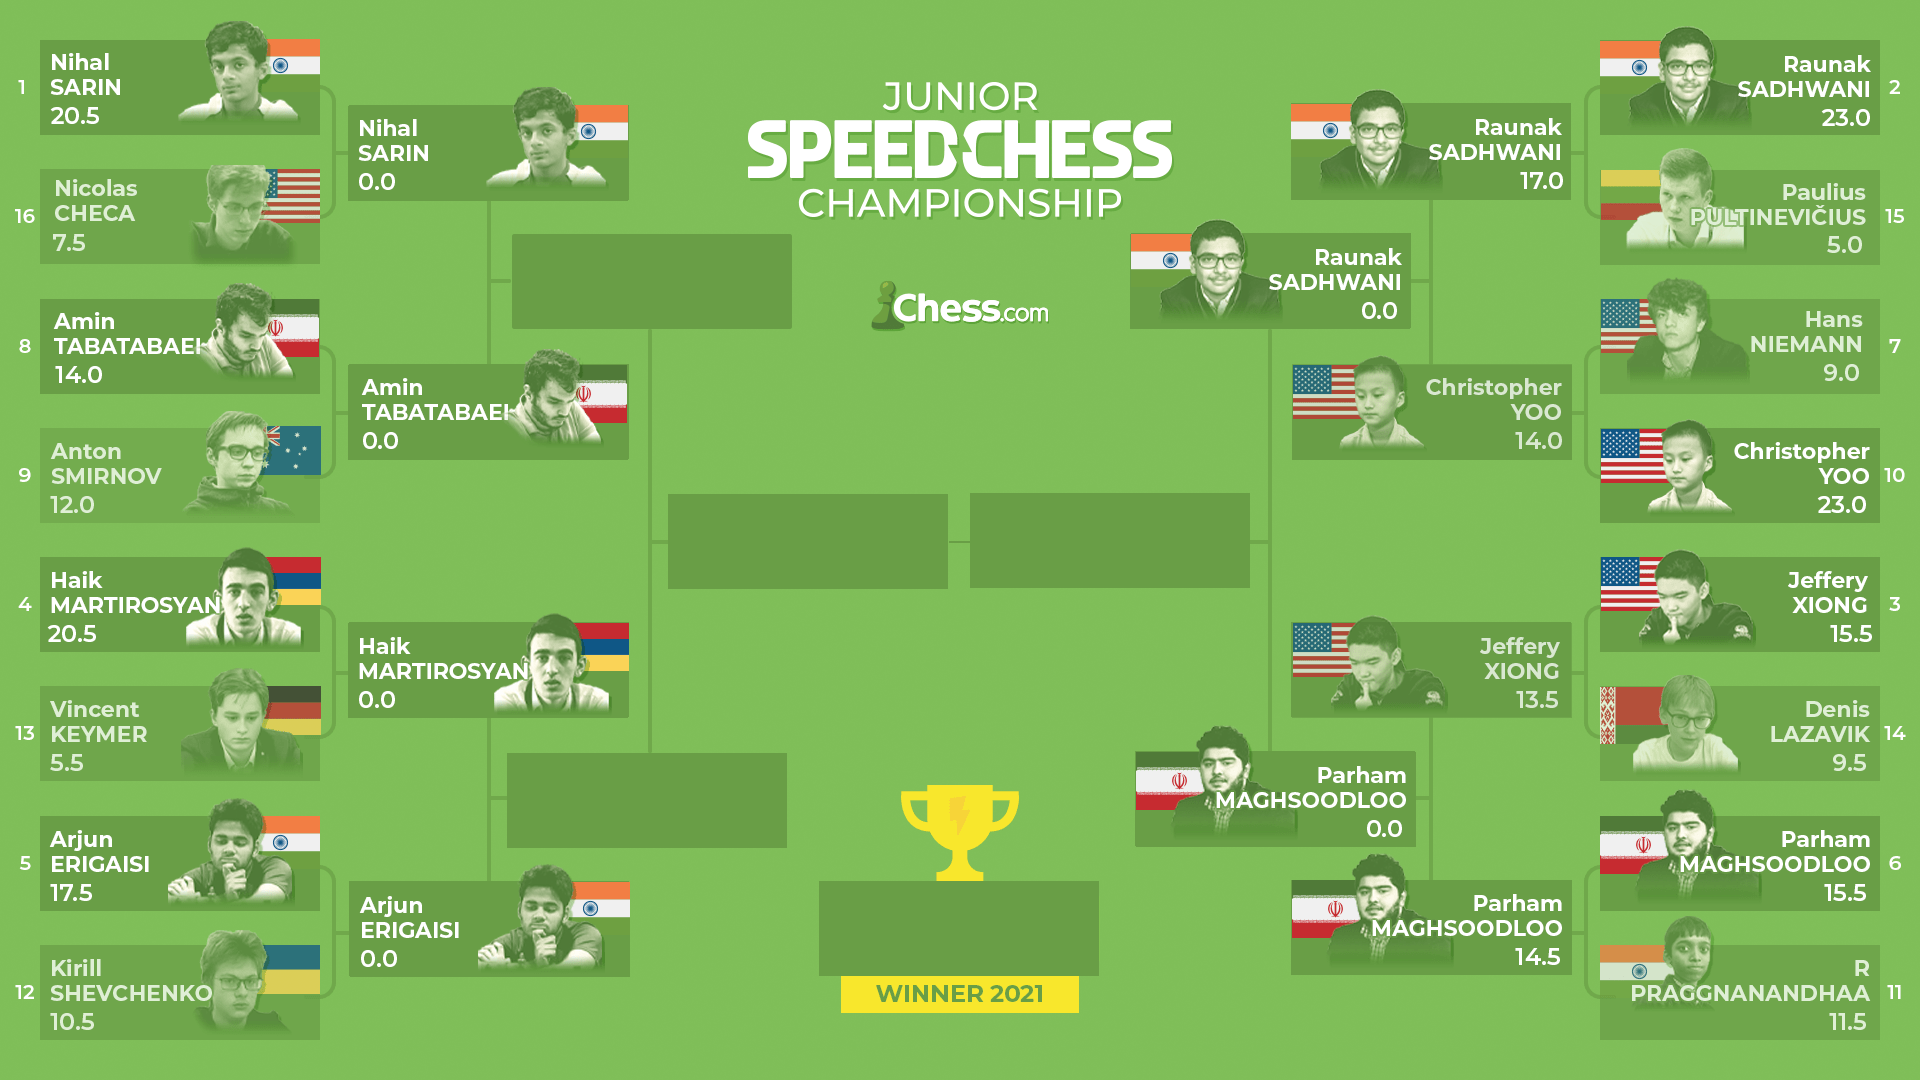 Junior Speed Chess Support